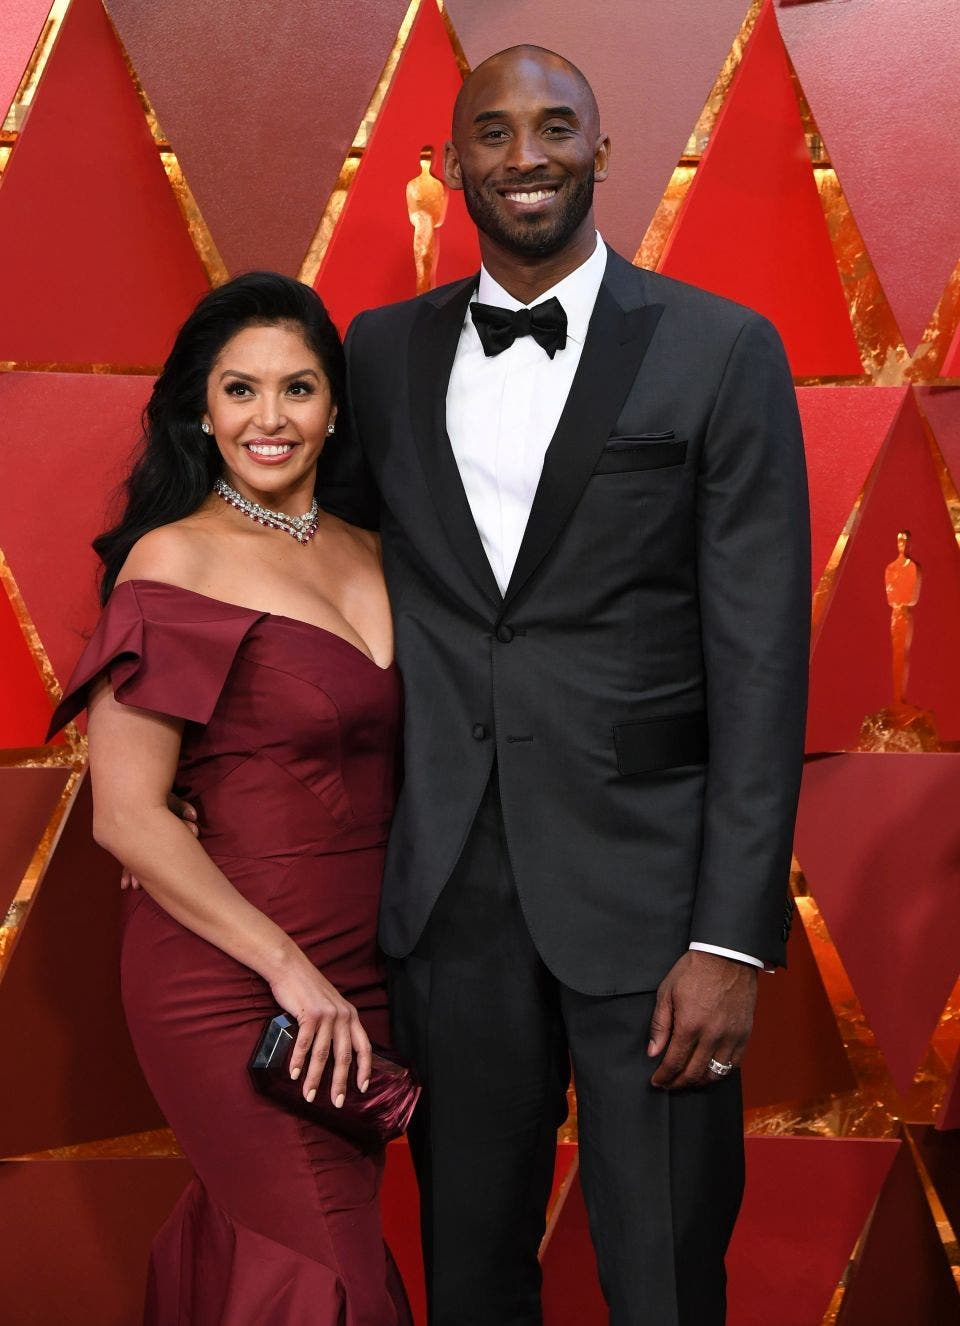 la femme de Kobe Bryant raconte l'enfer